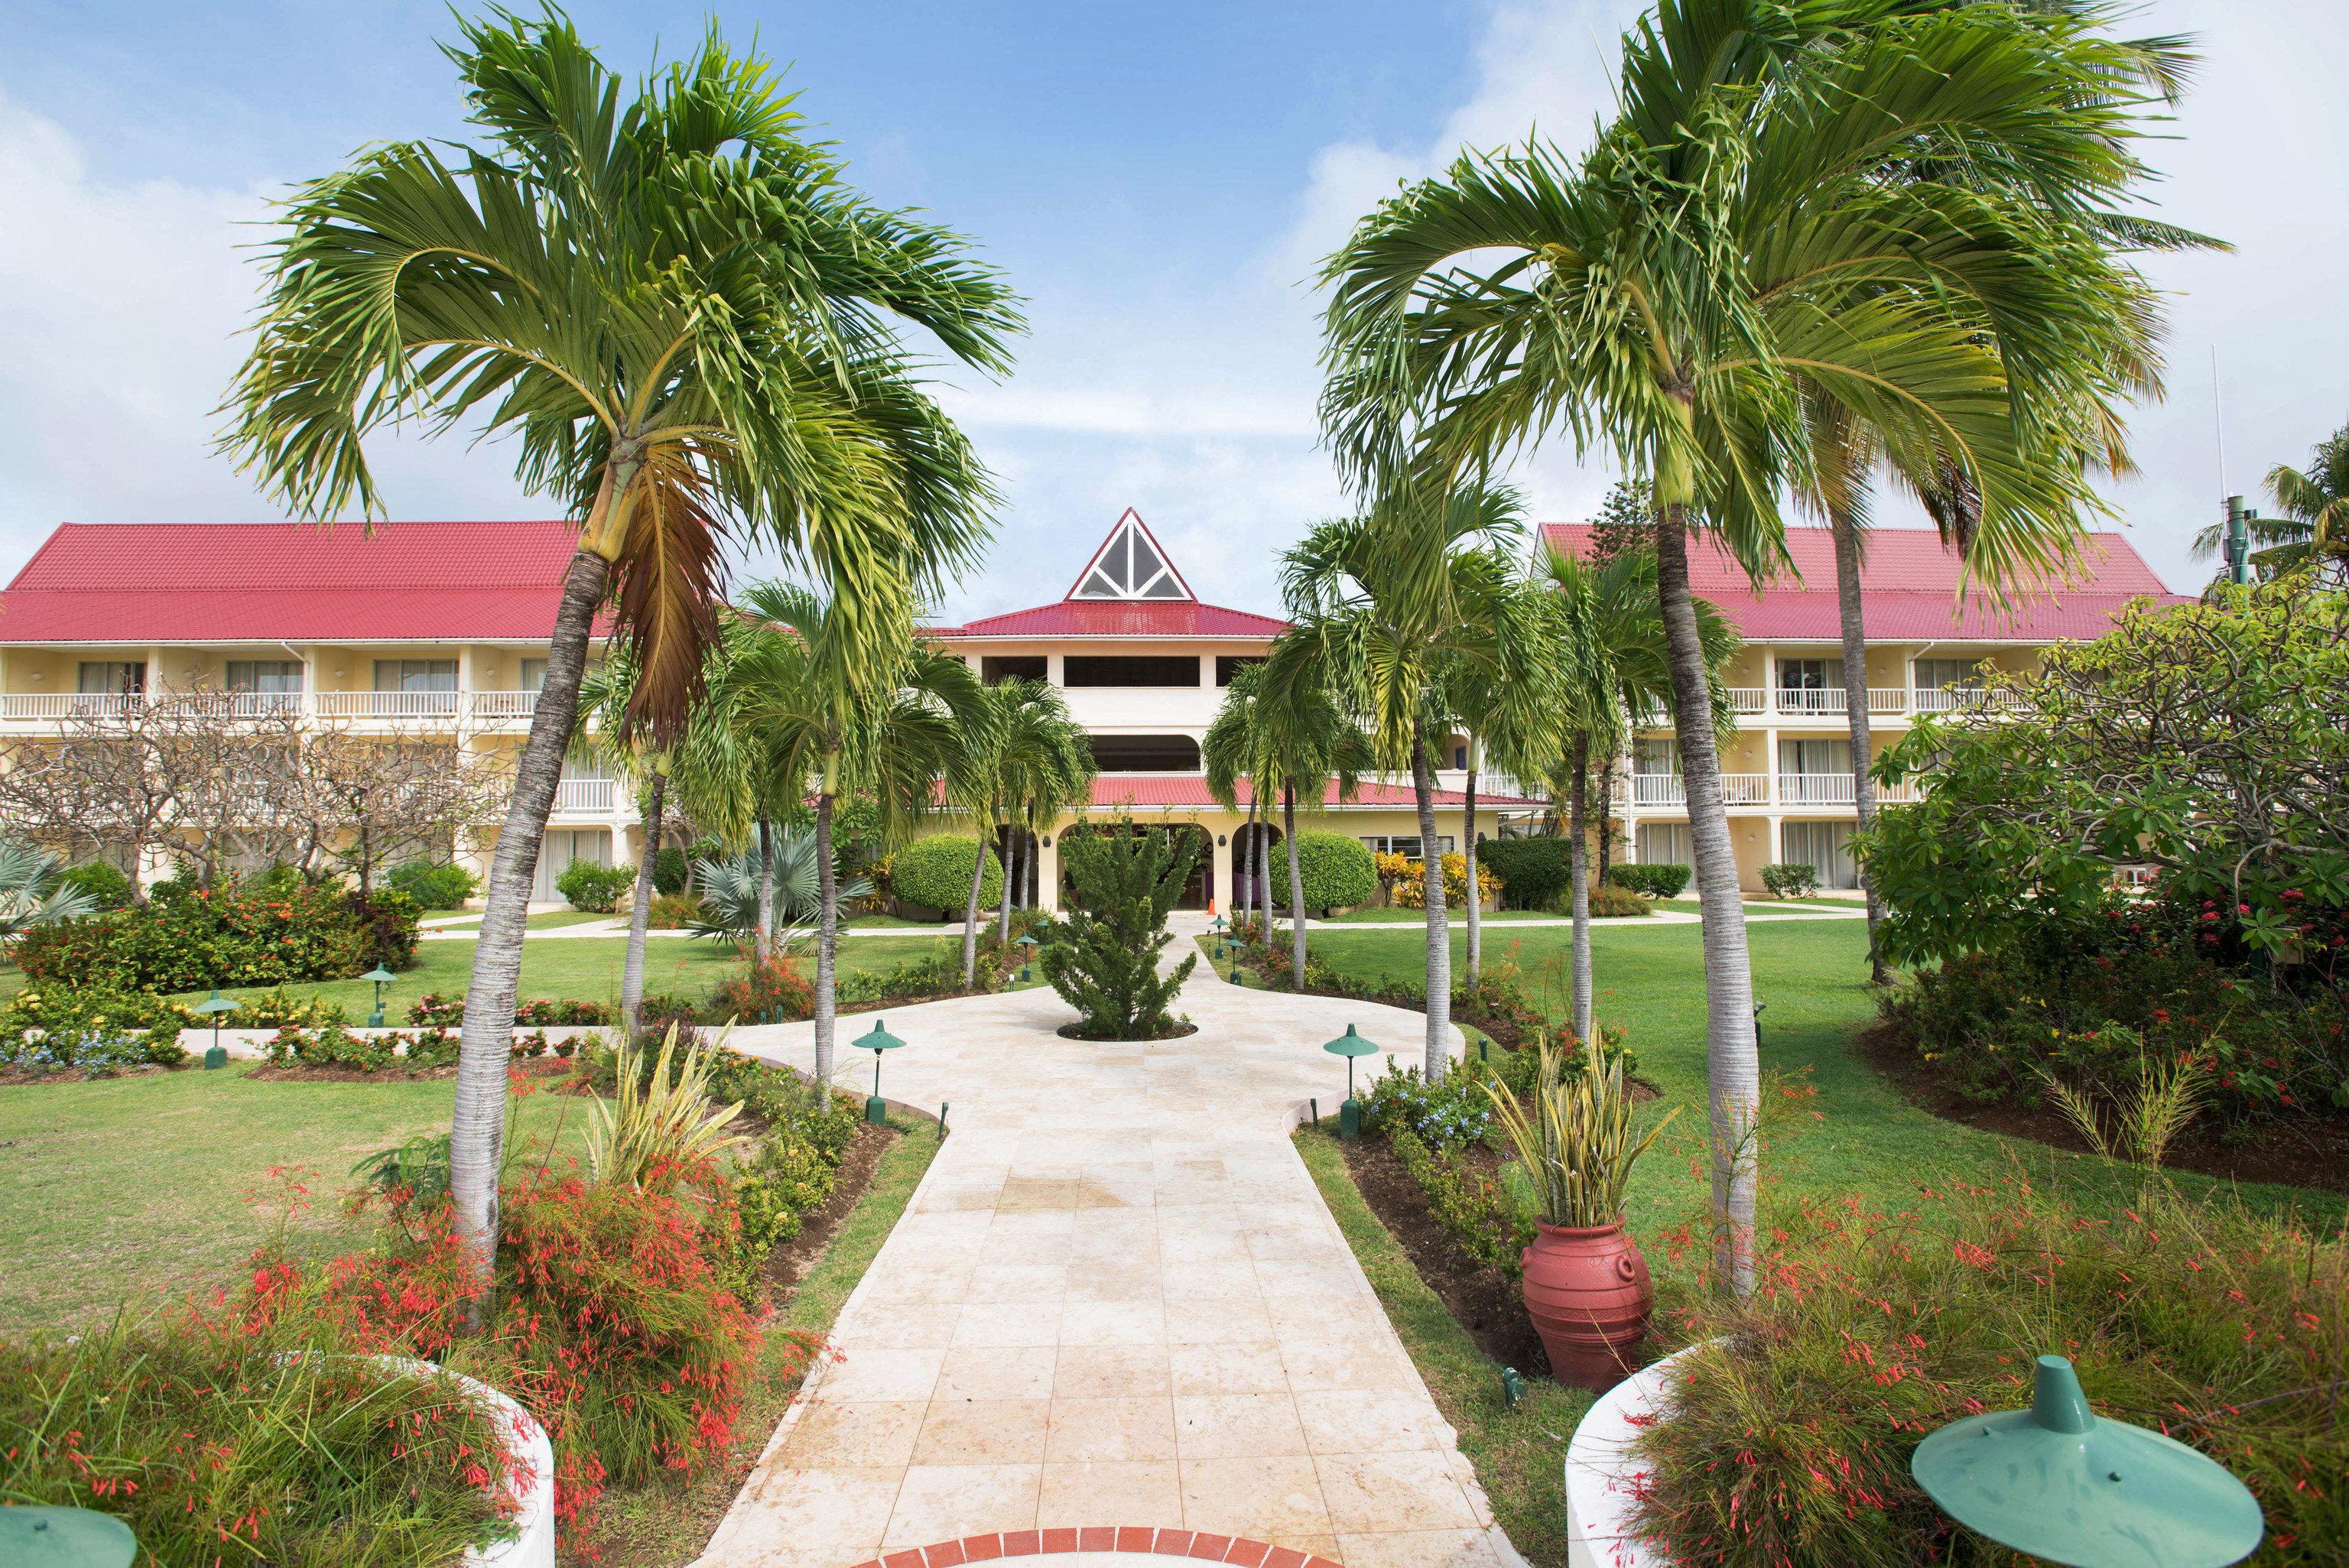 tree grass Resort lawn Garden walkway arecales house condominium plaza Courtyard hacienda palace botanical garden plant palm set shade